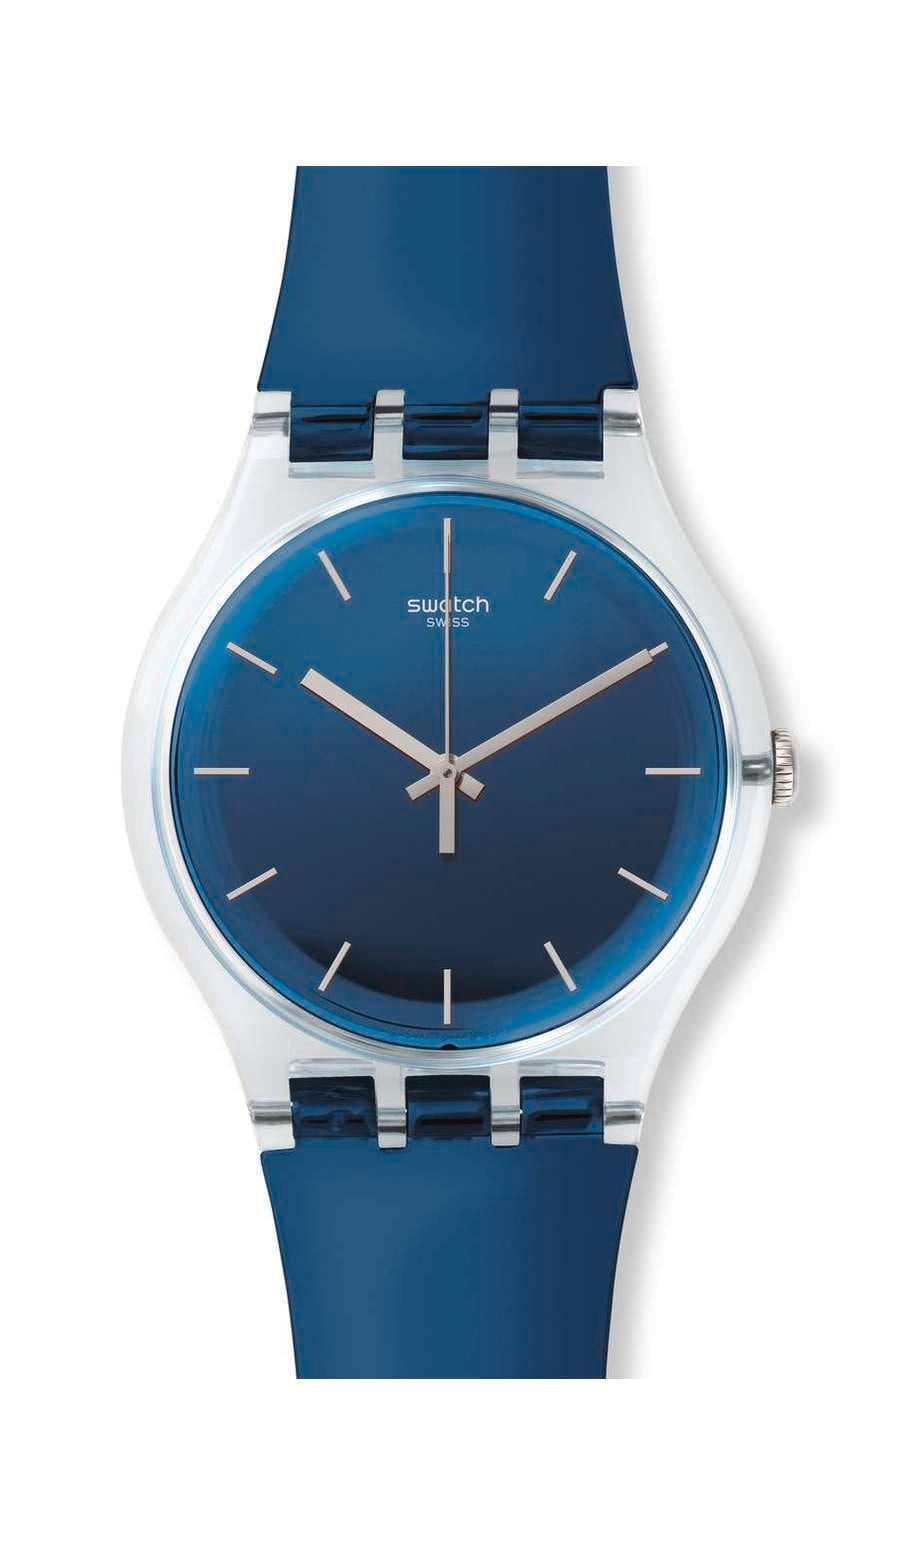 Swatch - ENCRIER - 1